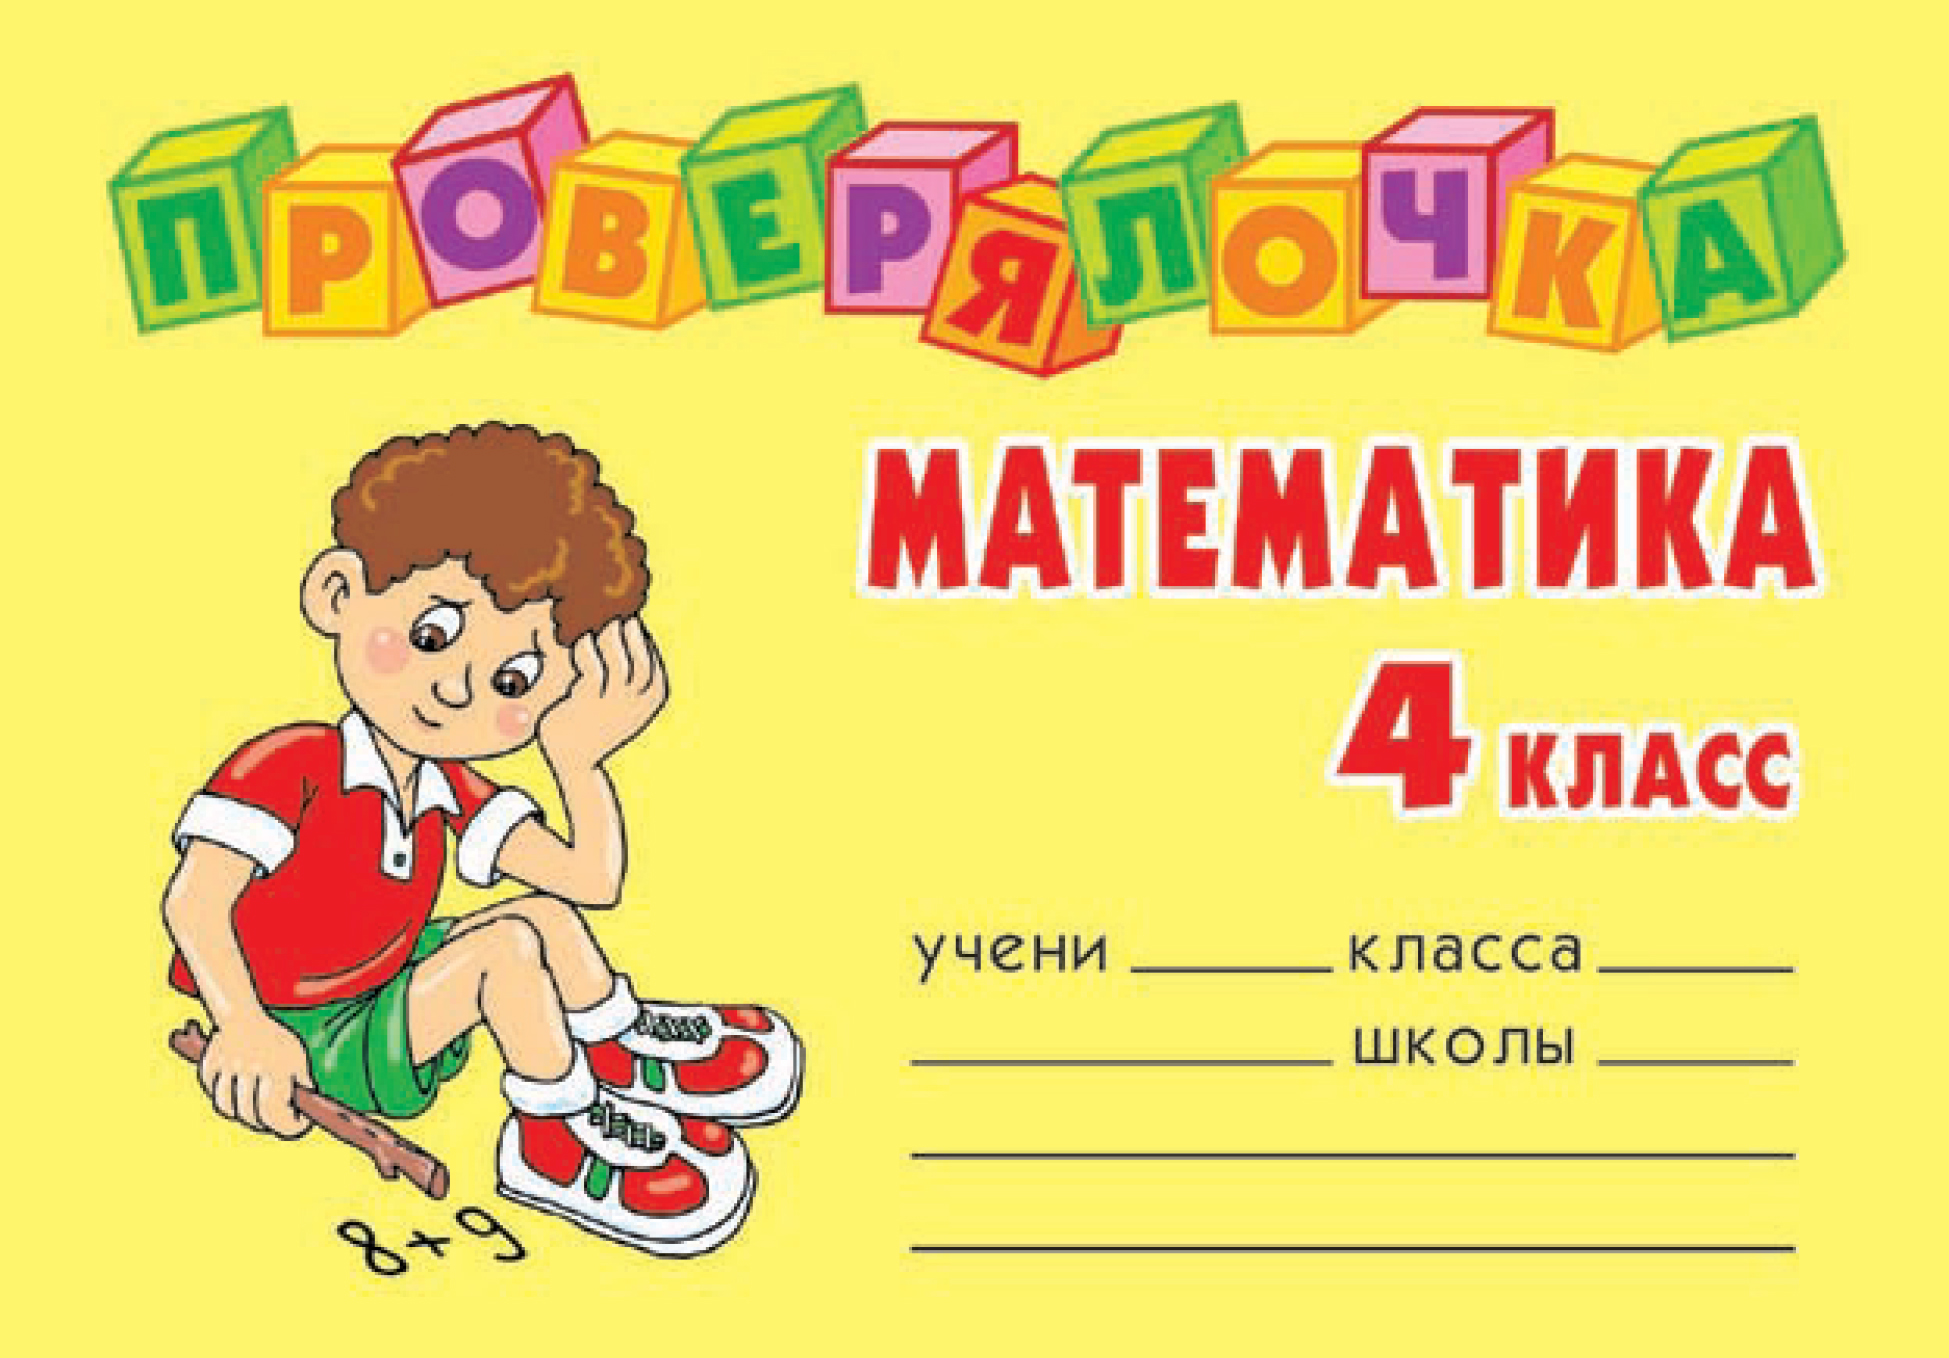 О. Д. Ушакова Математика. 4 класс о д ушакова математика 4 класс